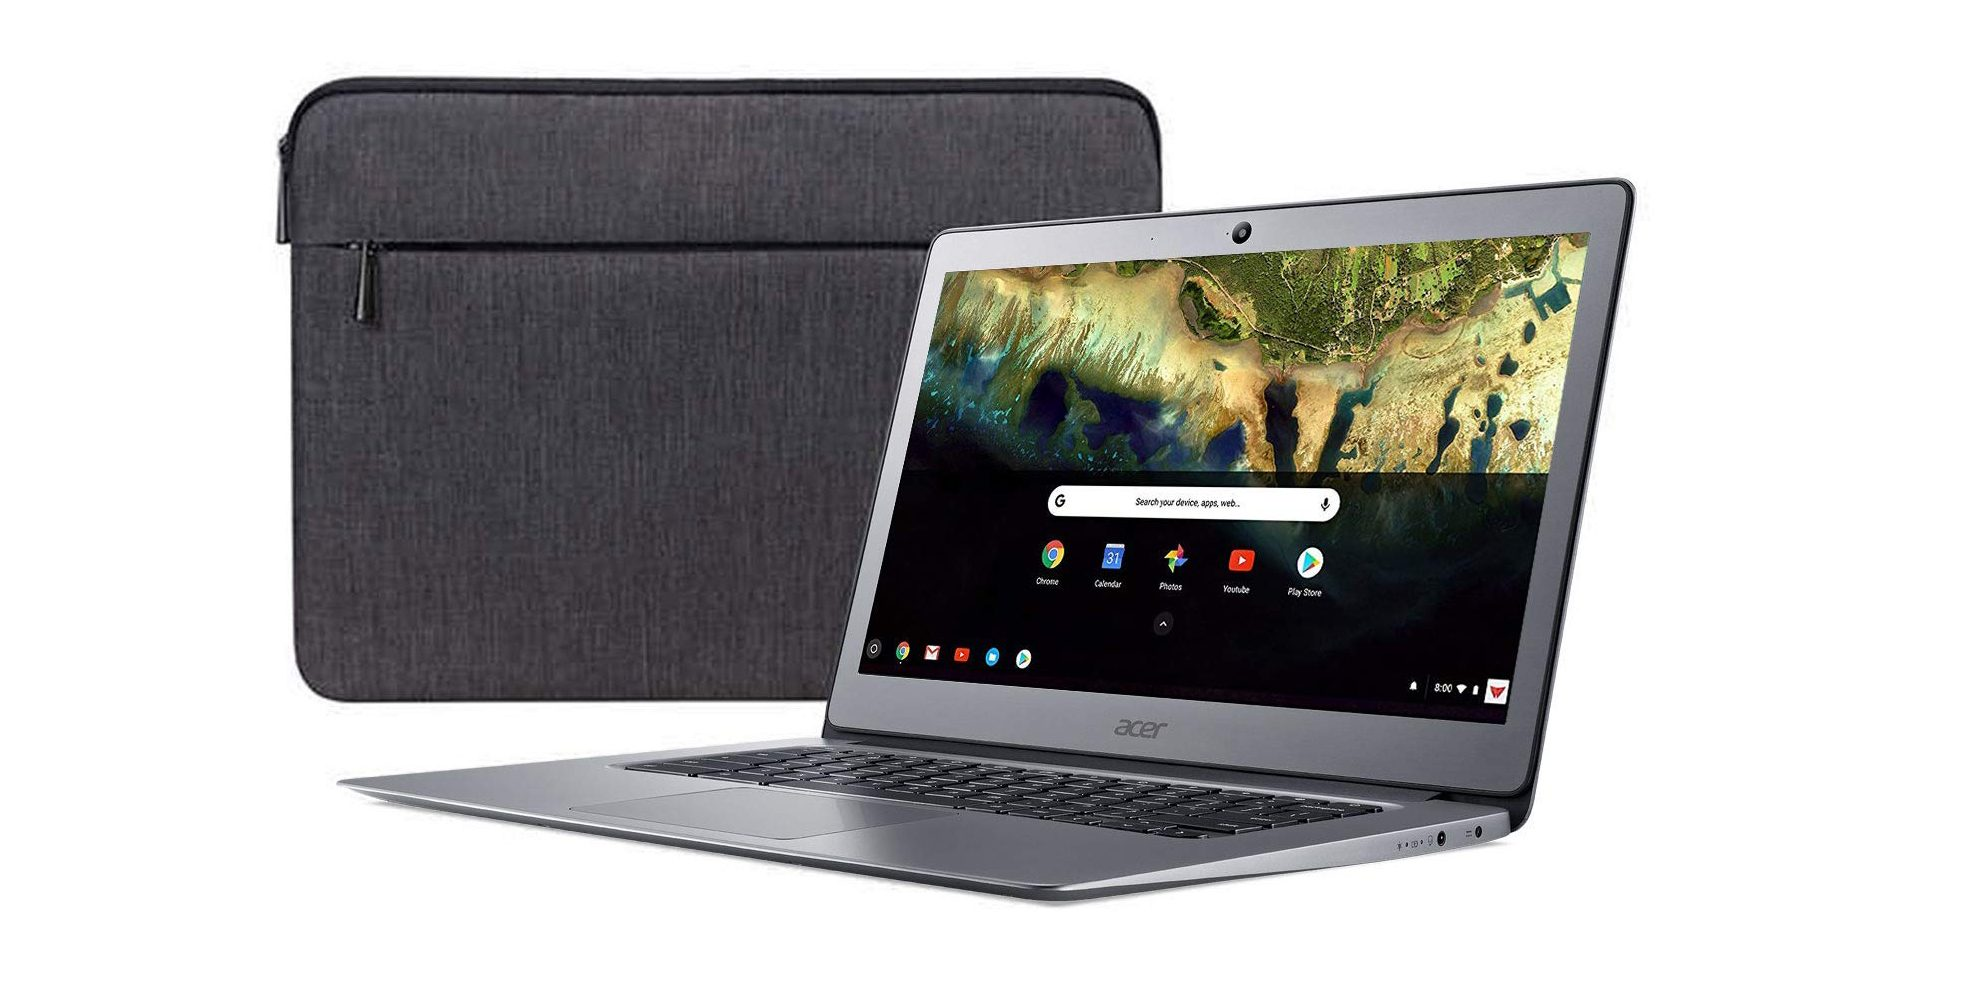 9to5Toys Letzter Anruf: Acer Chromebook 14 239 $, Google Home Hub 87 $, TP-Link Smart Lighting 30 $, mehr